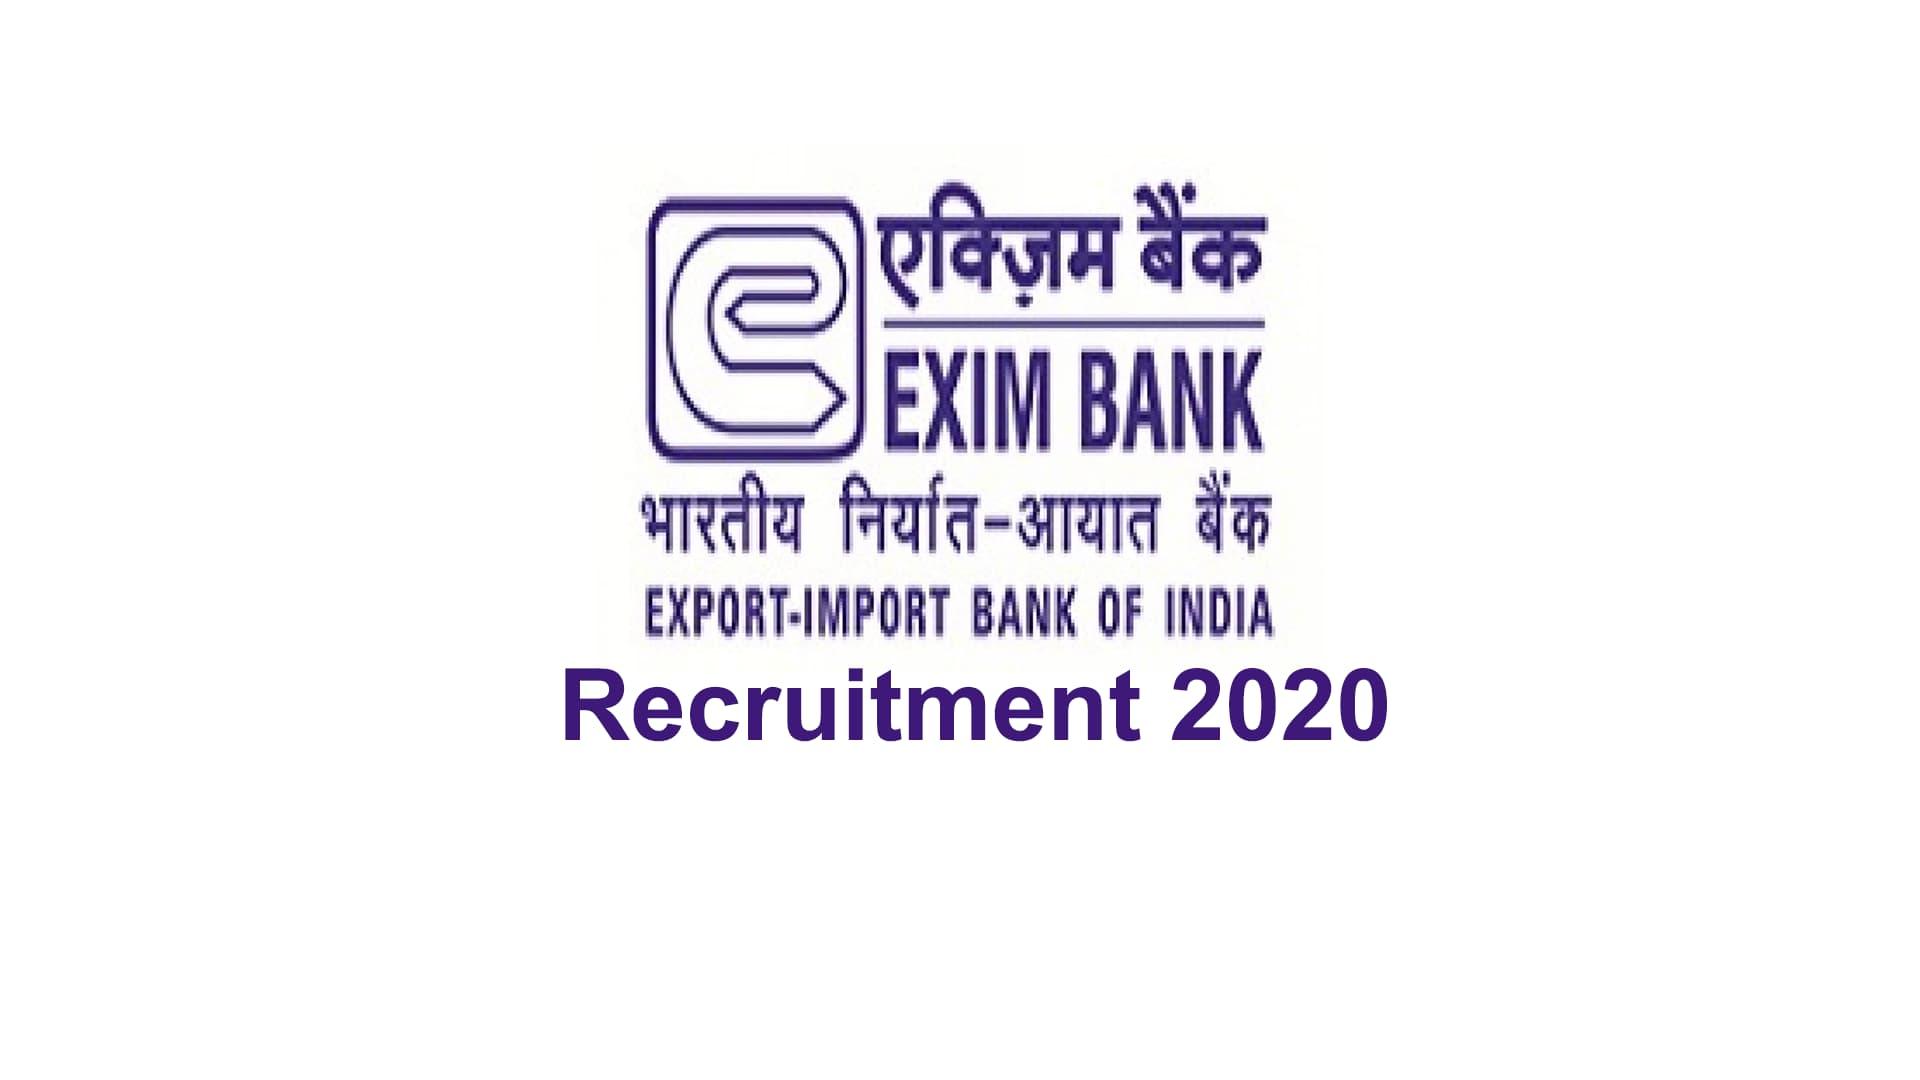 EXIM Bank Recruitment 2020